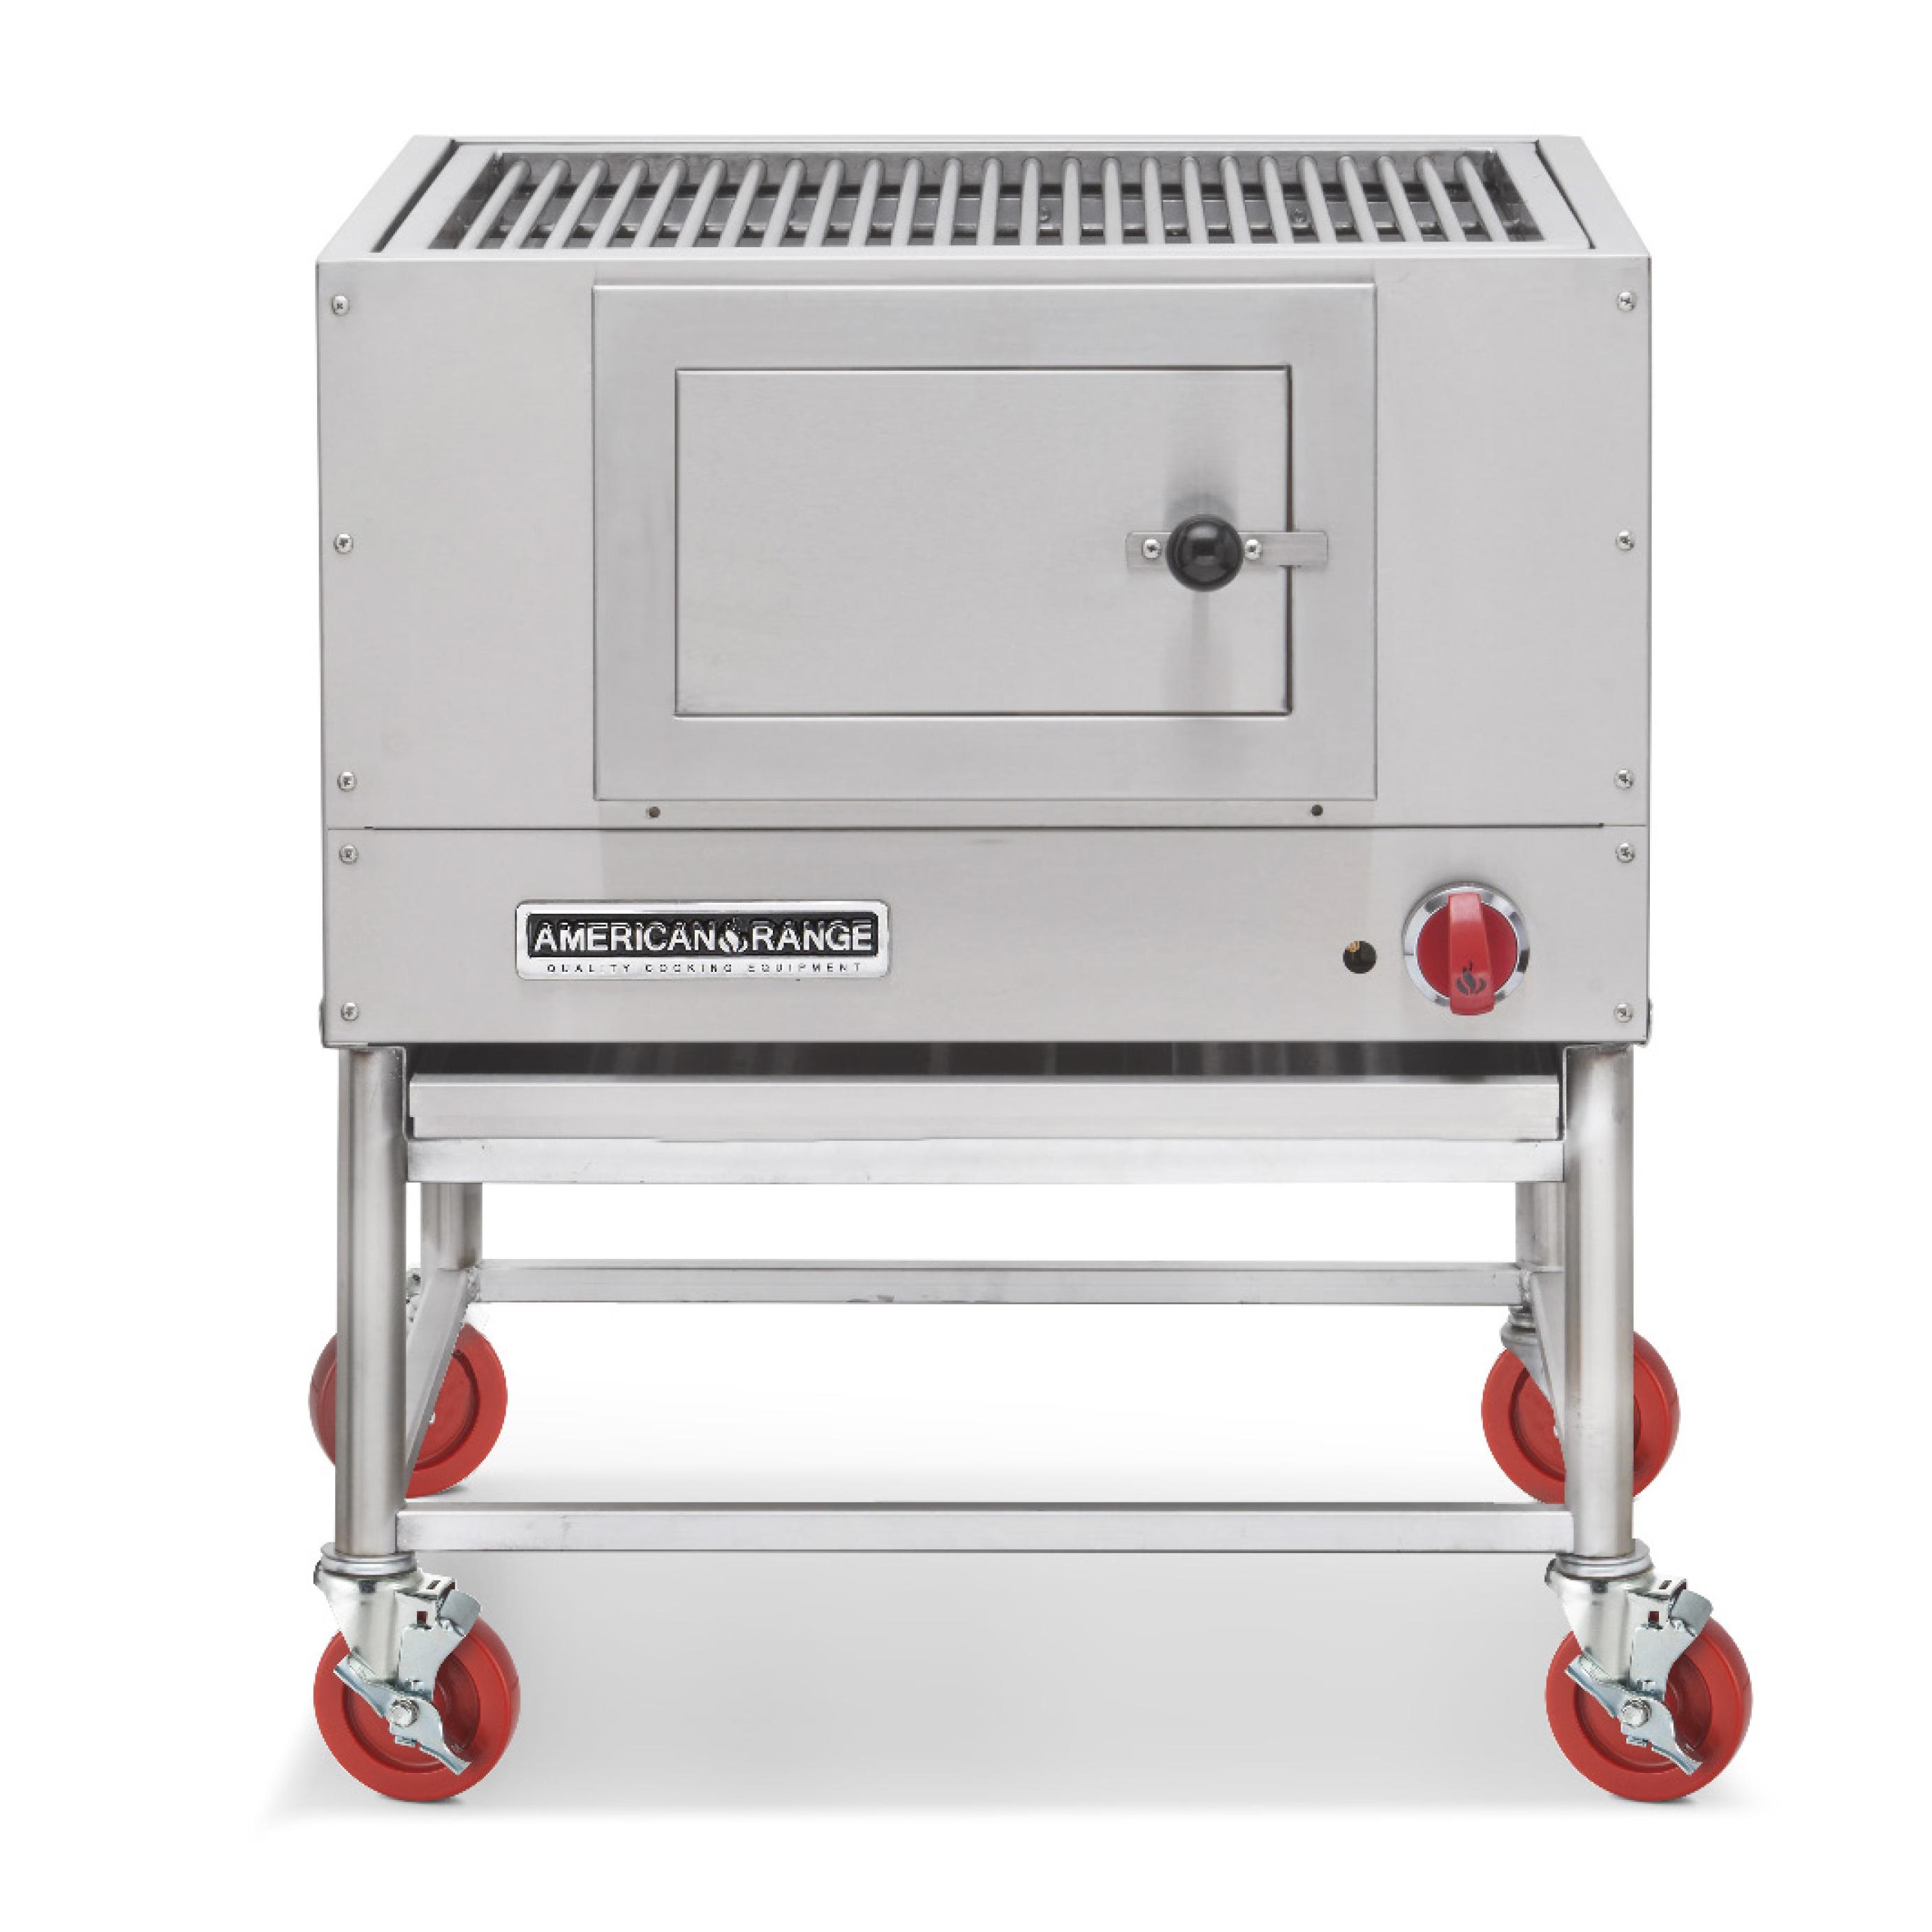 American Range AMSQ-60 charbroiler, wood burning